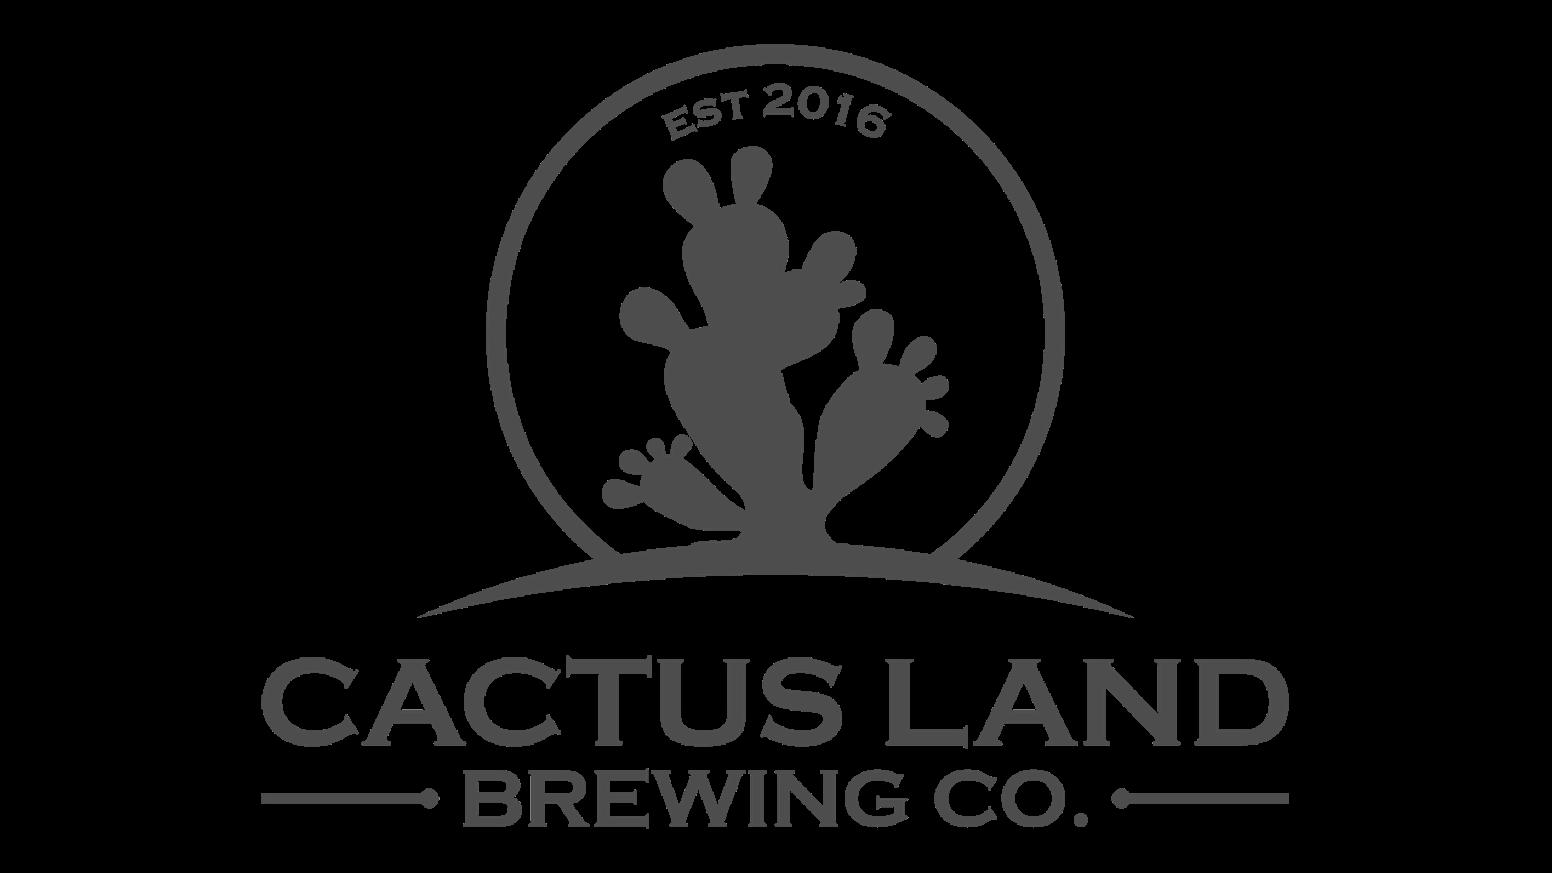 Cactus Land Brewing Co. by Dustin Teague —Kickstarter